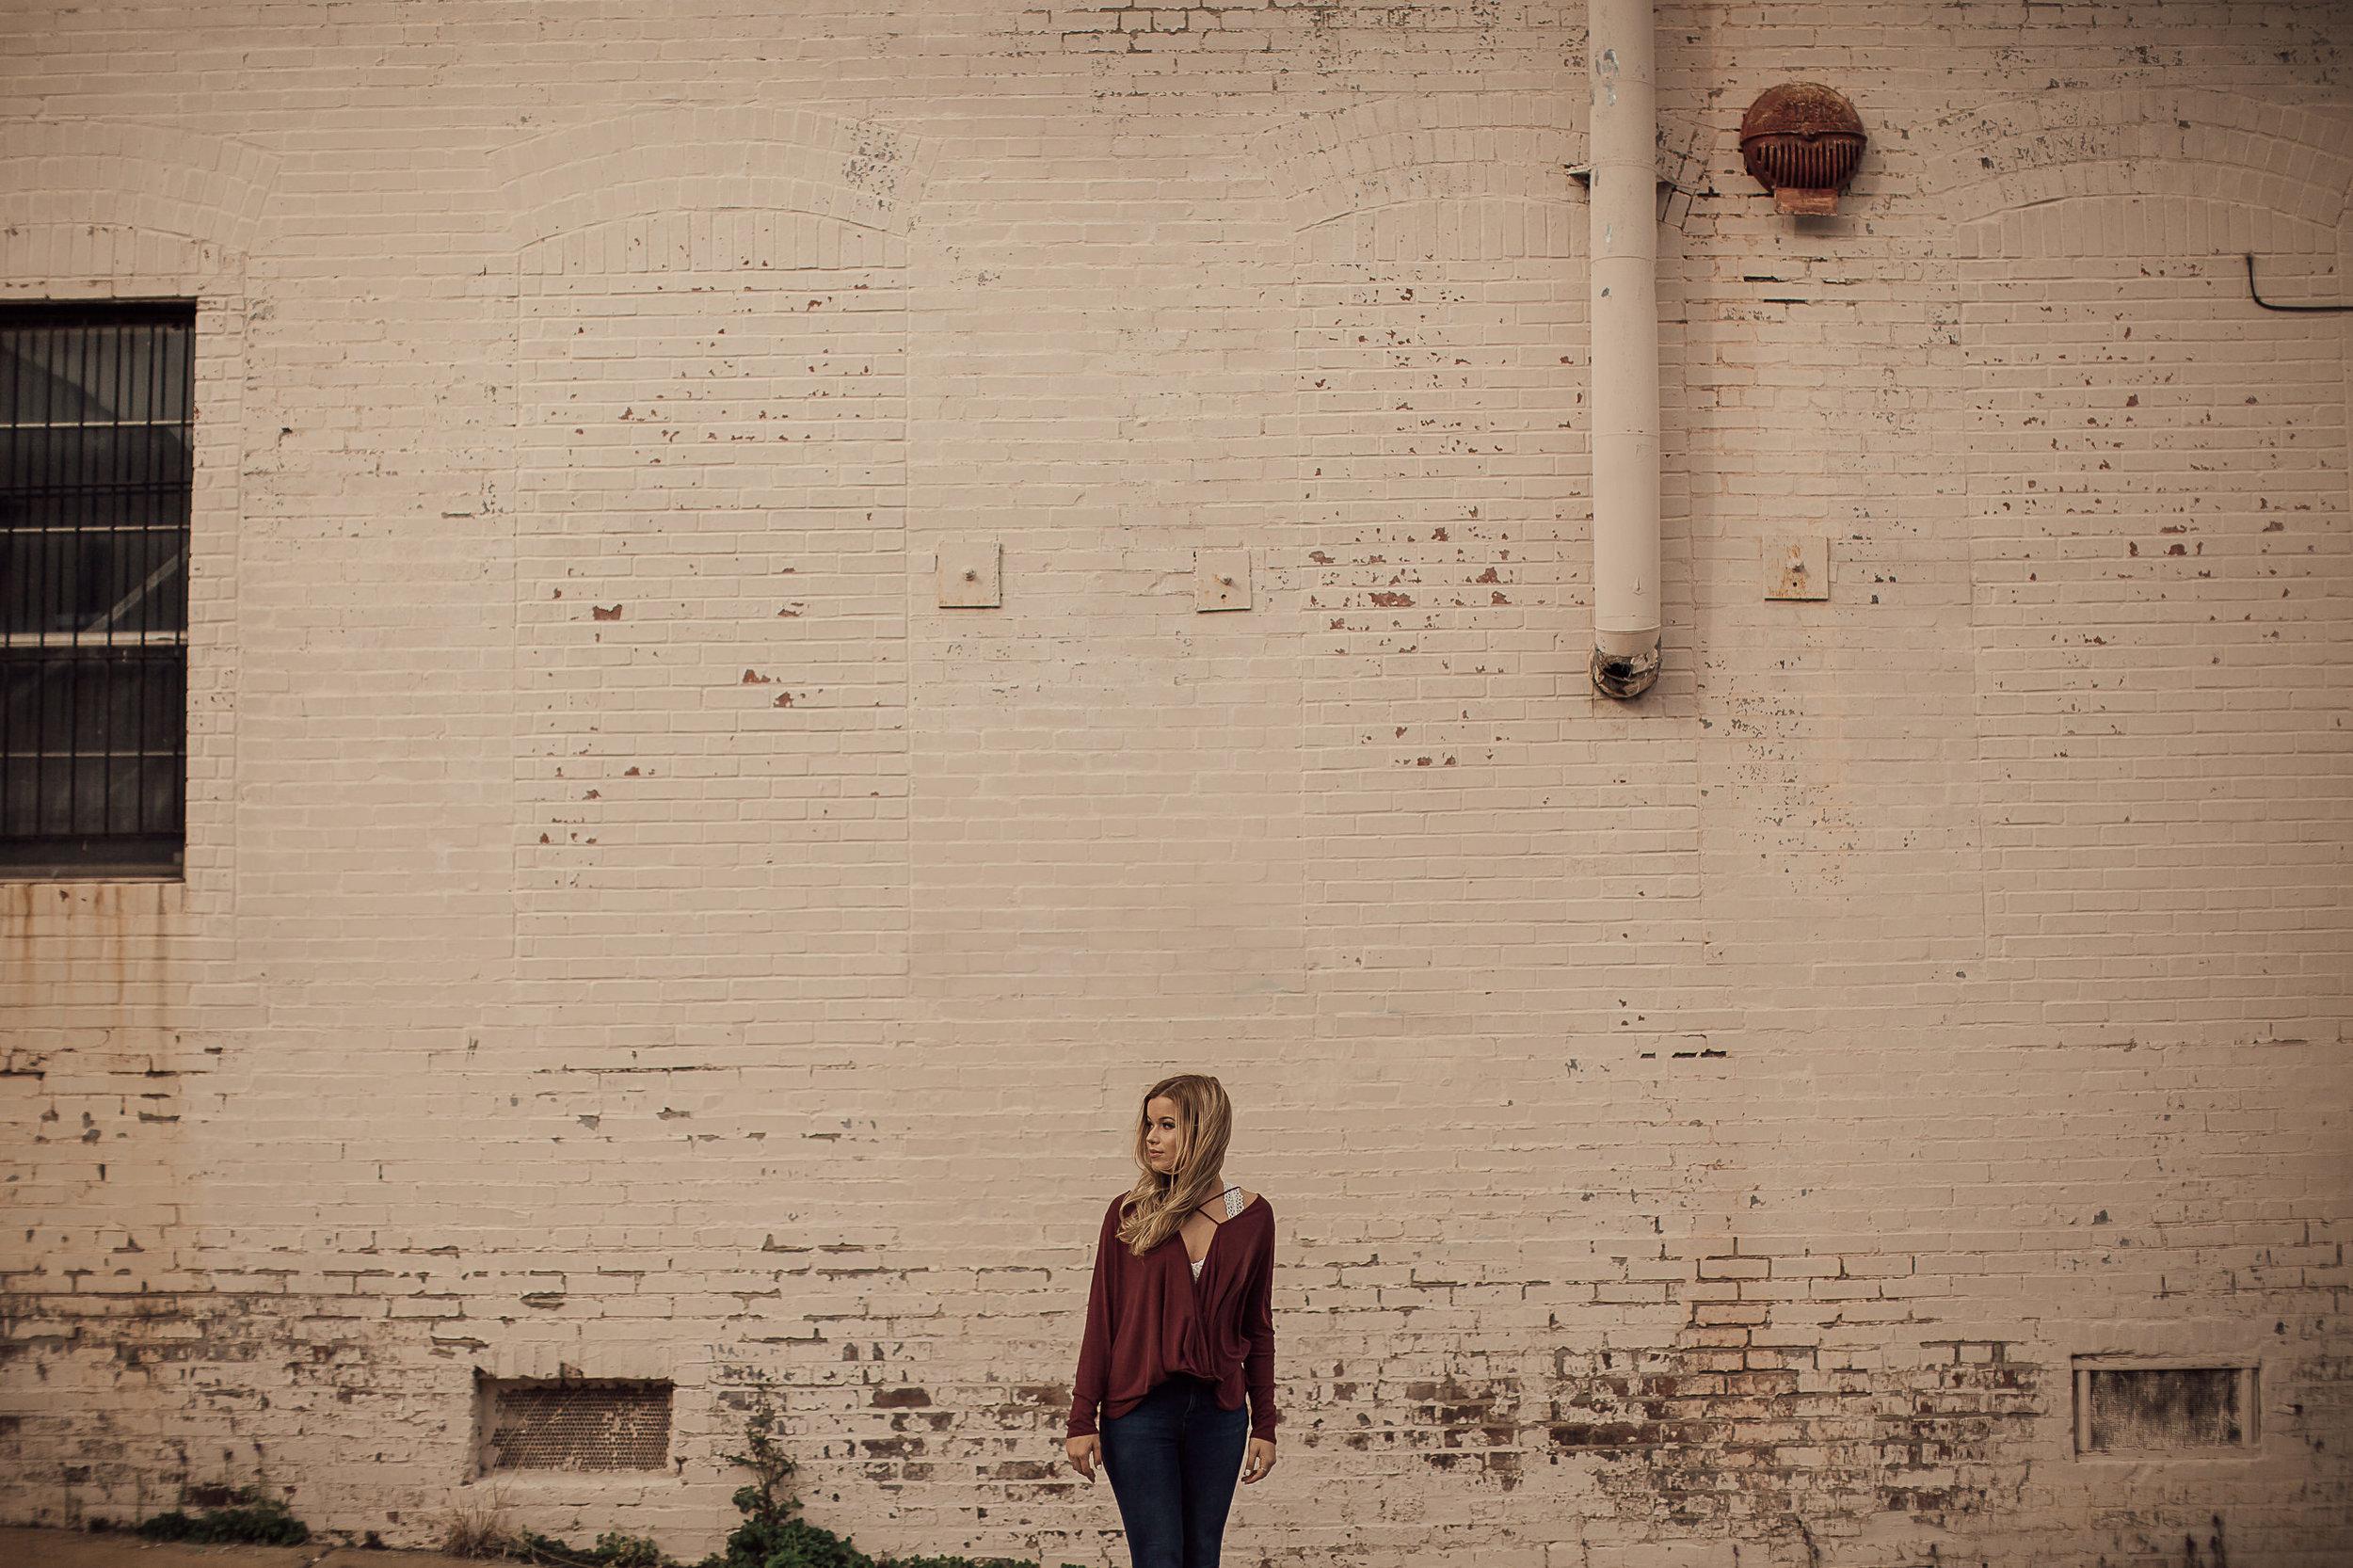 memphis-senior-photographer-urban-downtown-memphis-cassie-cook-photography-7.jpg